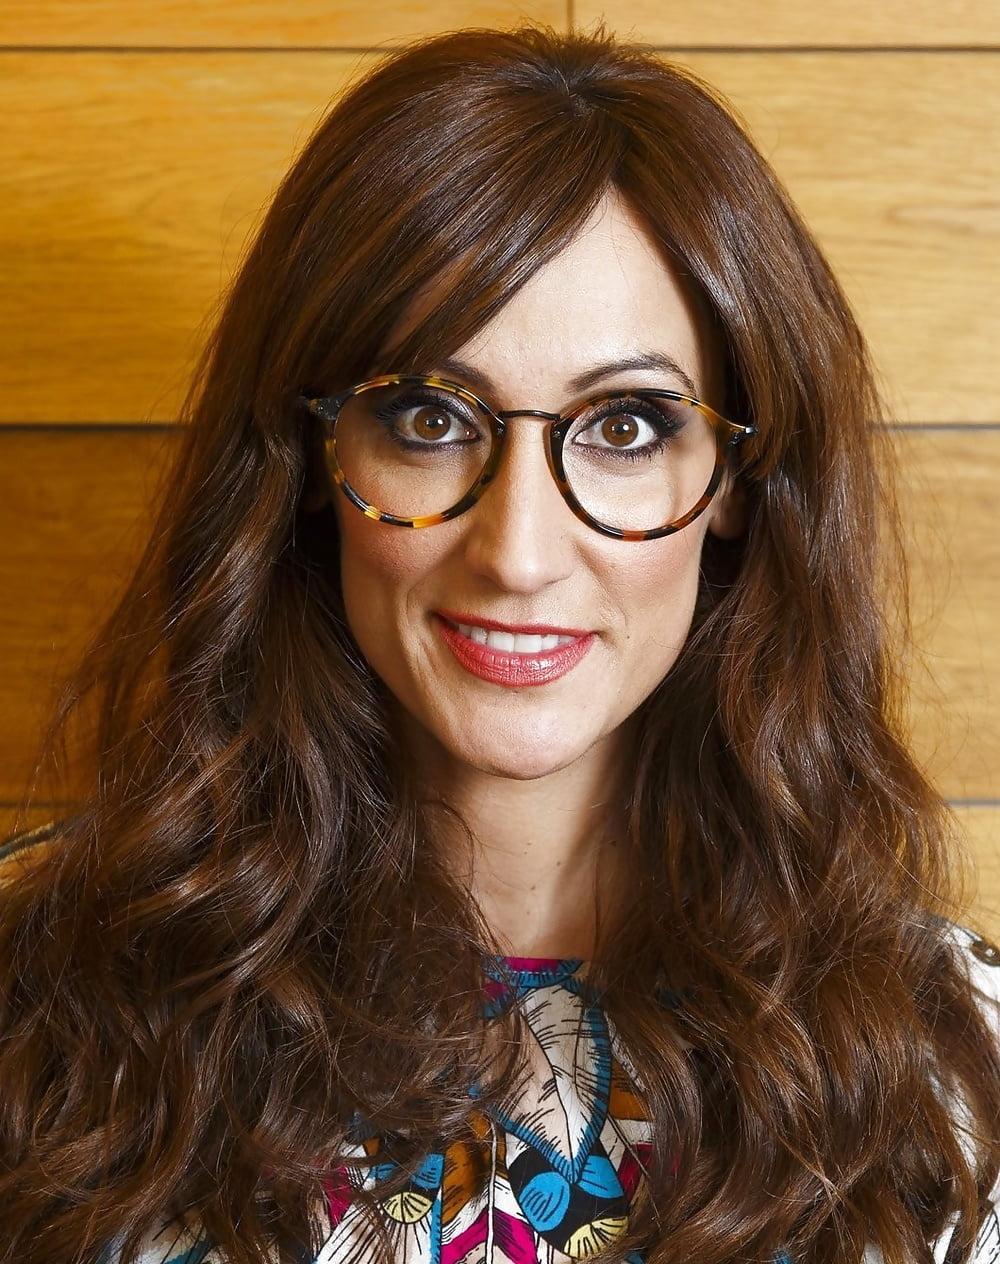 Ana Margade Porno ana morgade (spanish celebrity) - 77 pics | xhamster